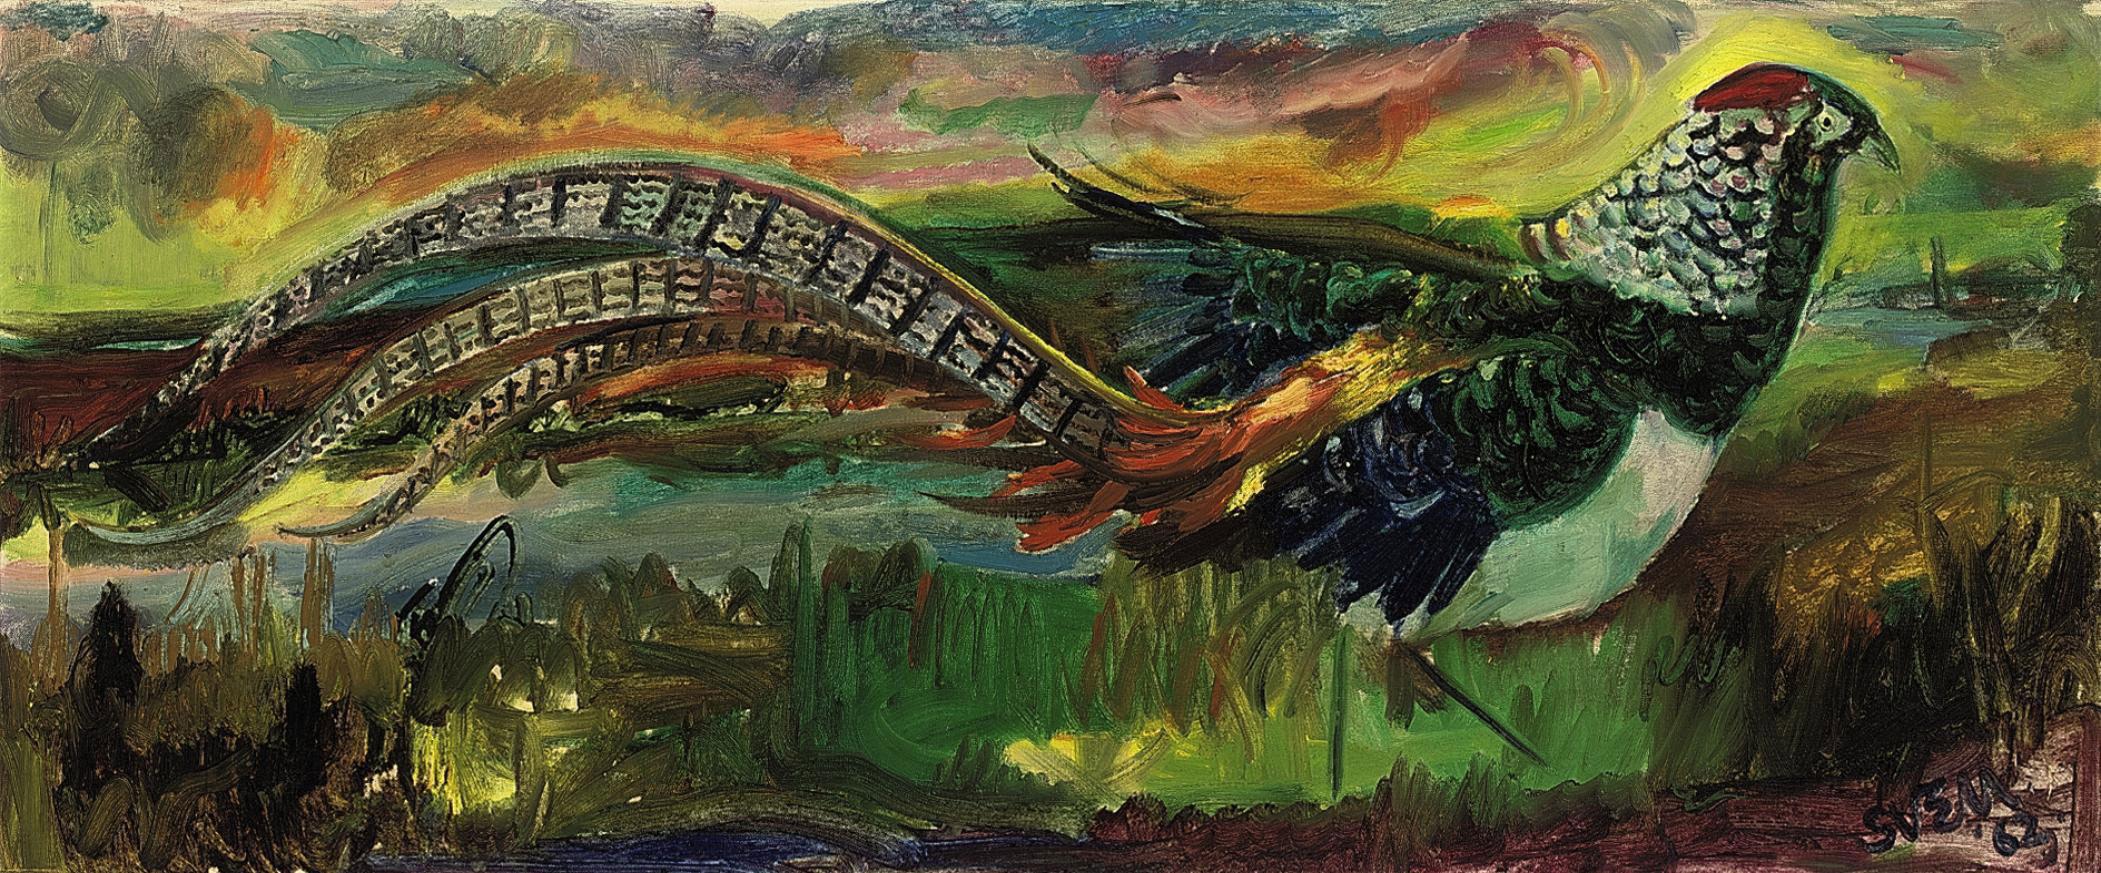 Painting of an Amhurst Pheasant